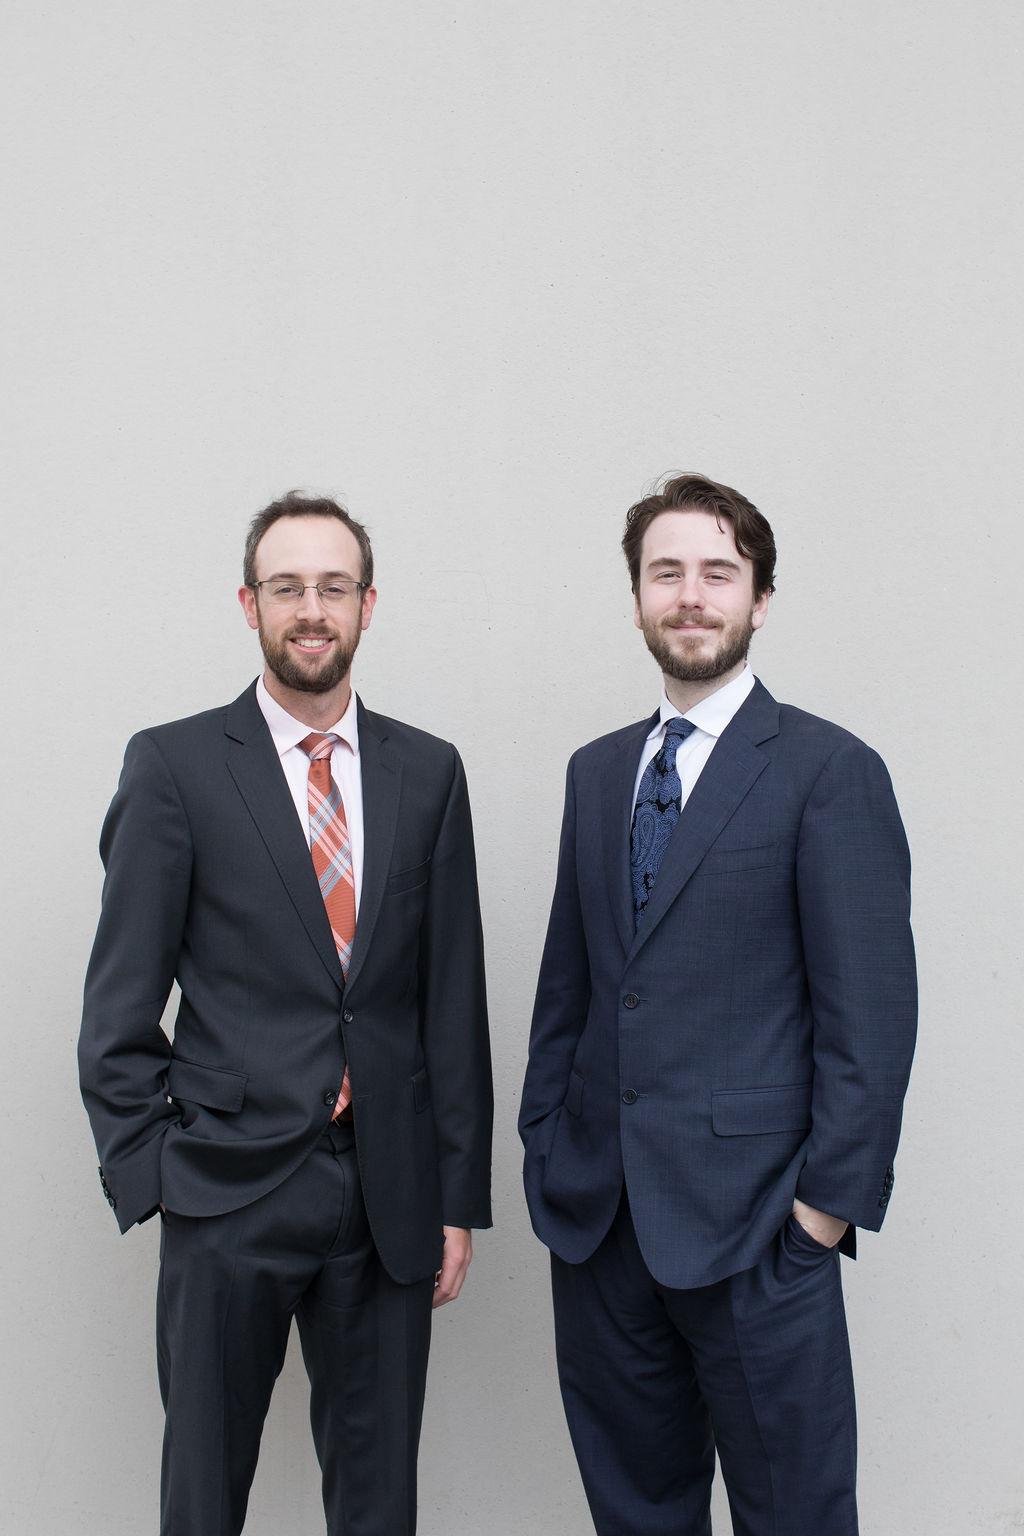 David Sherr & Jordan Neal